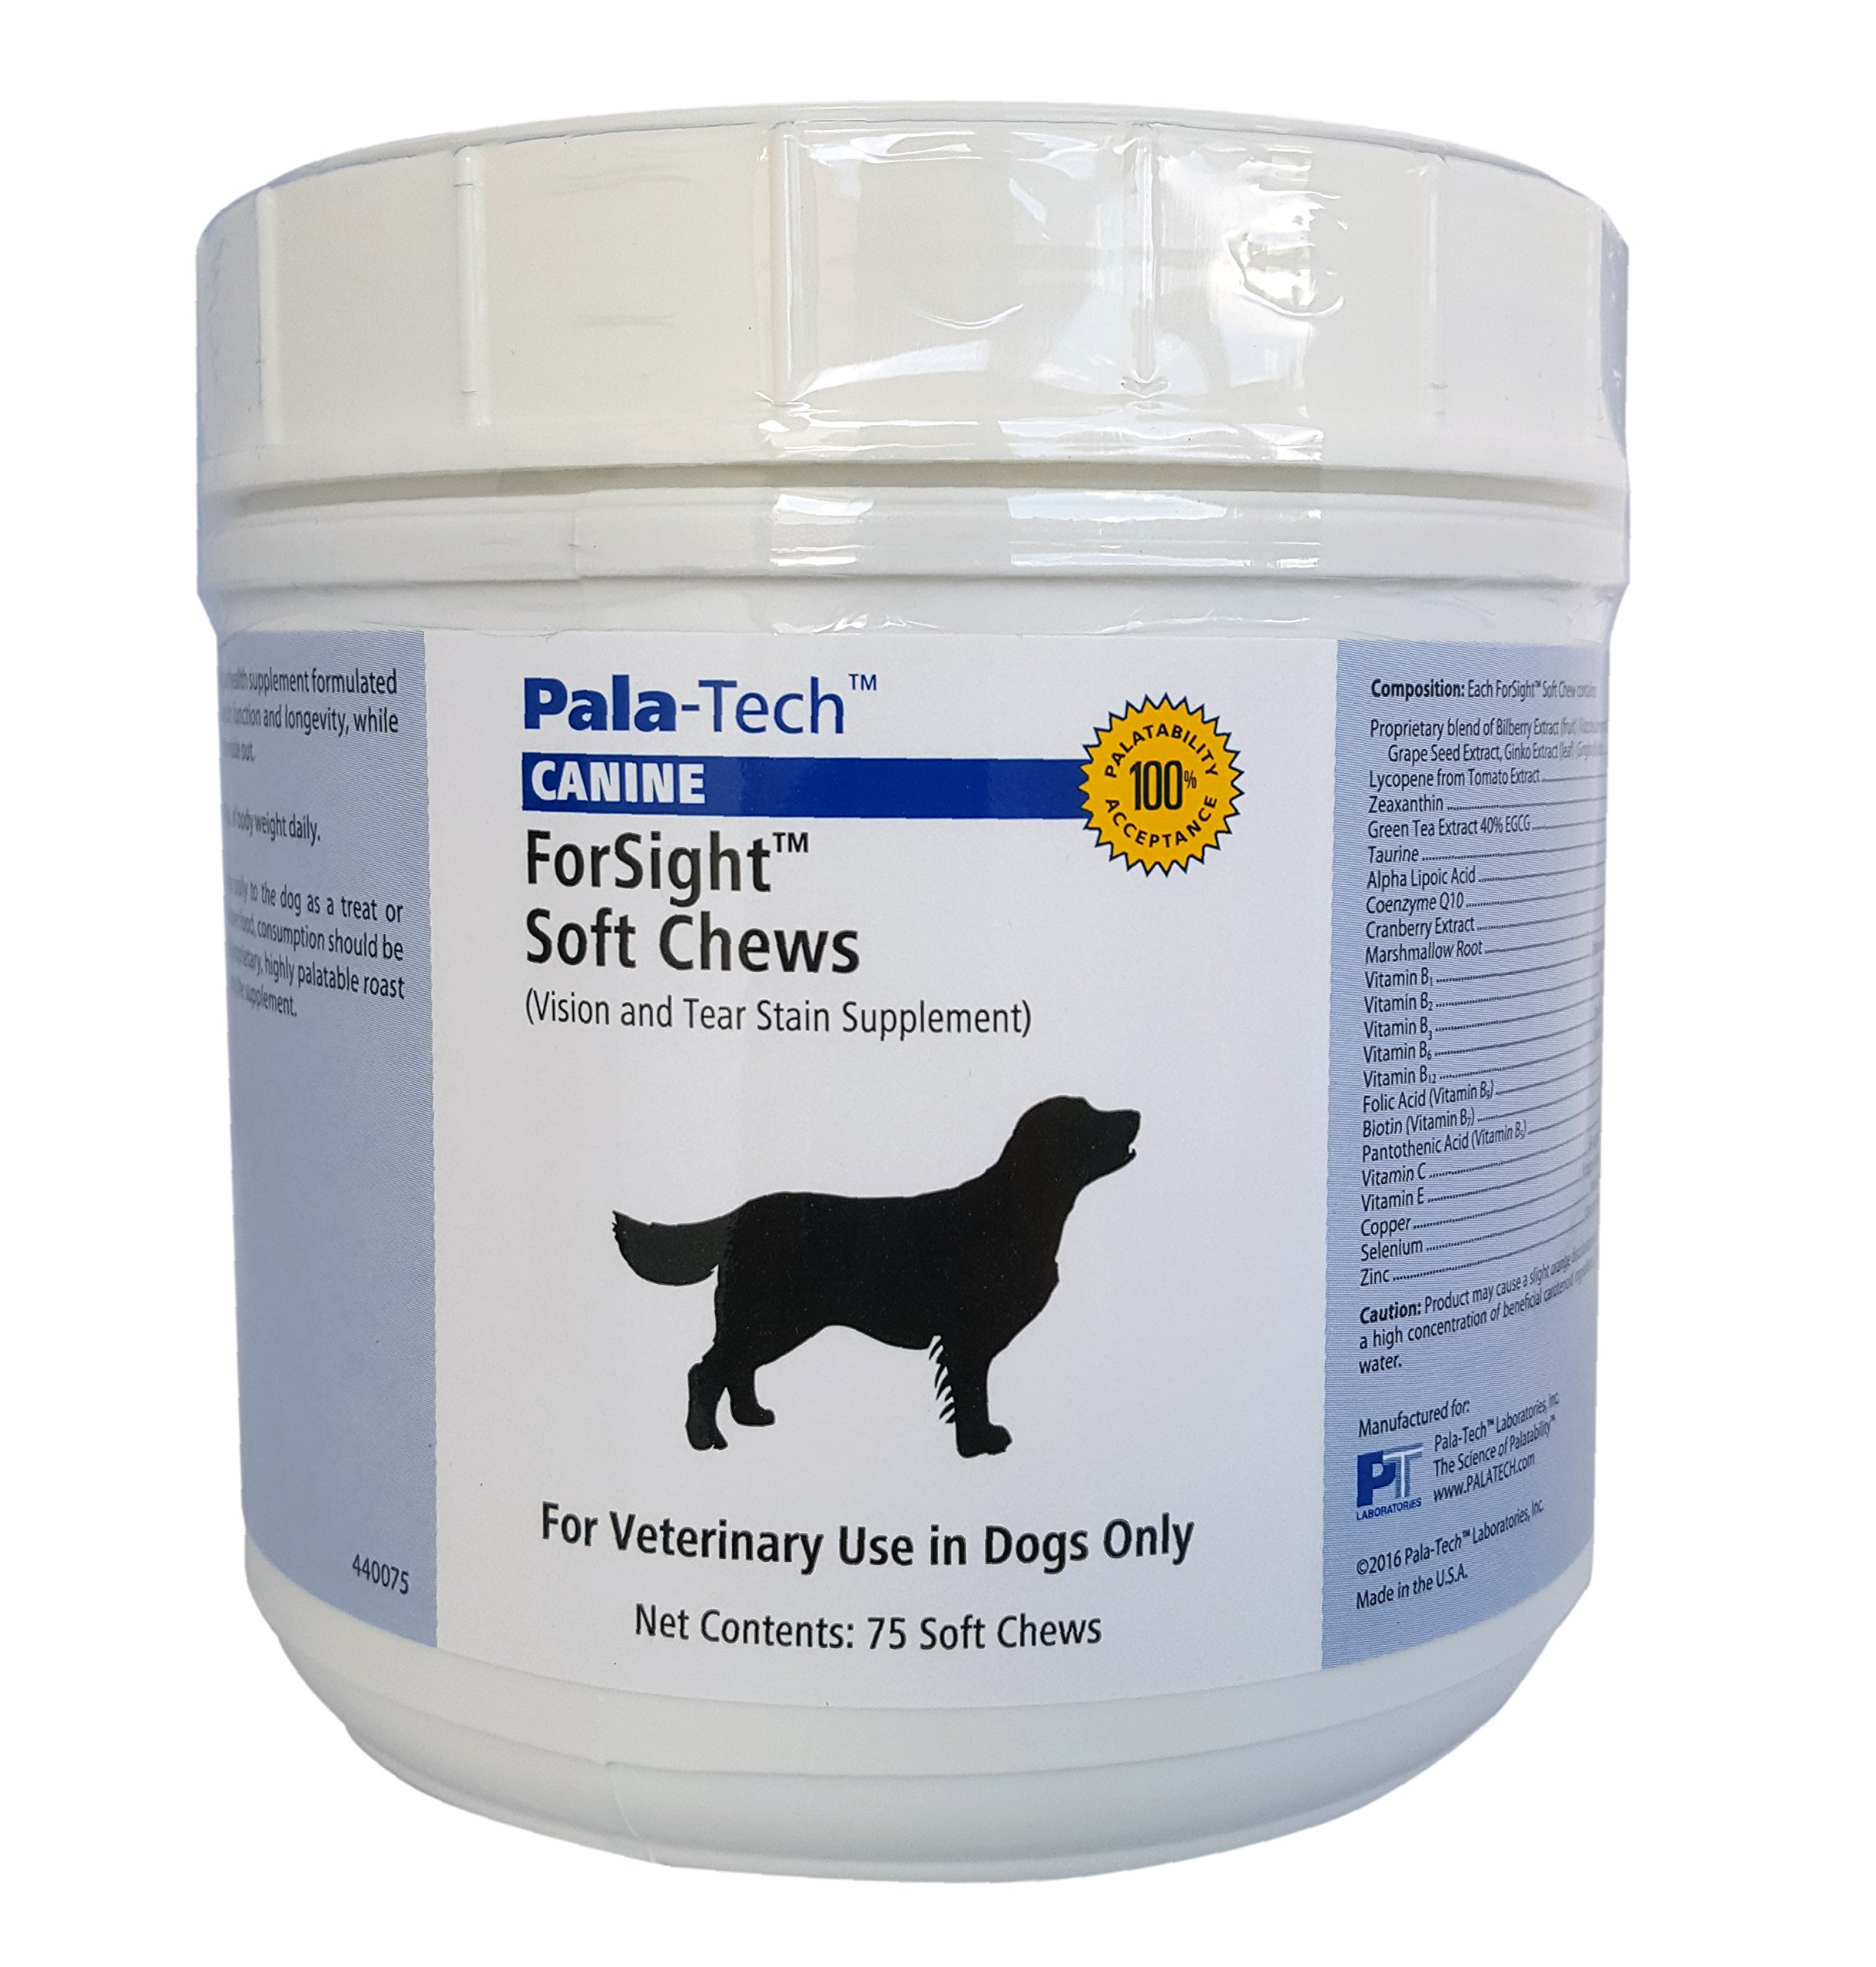 Pala Tech Canine Forsight Soft Chews